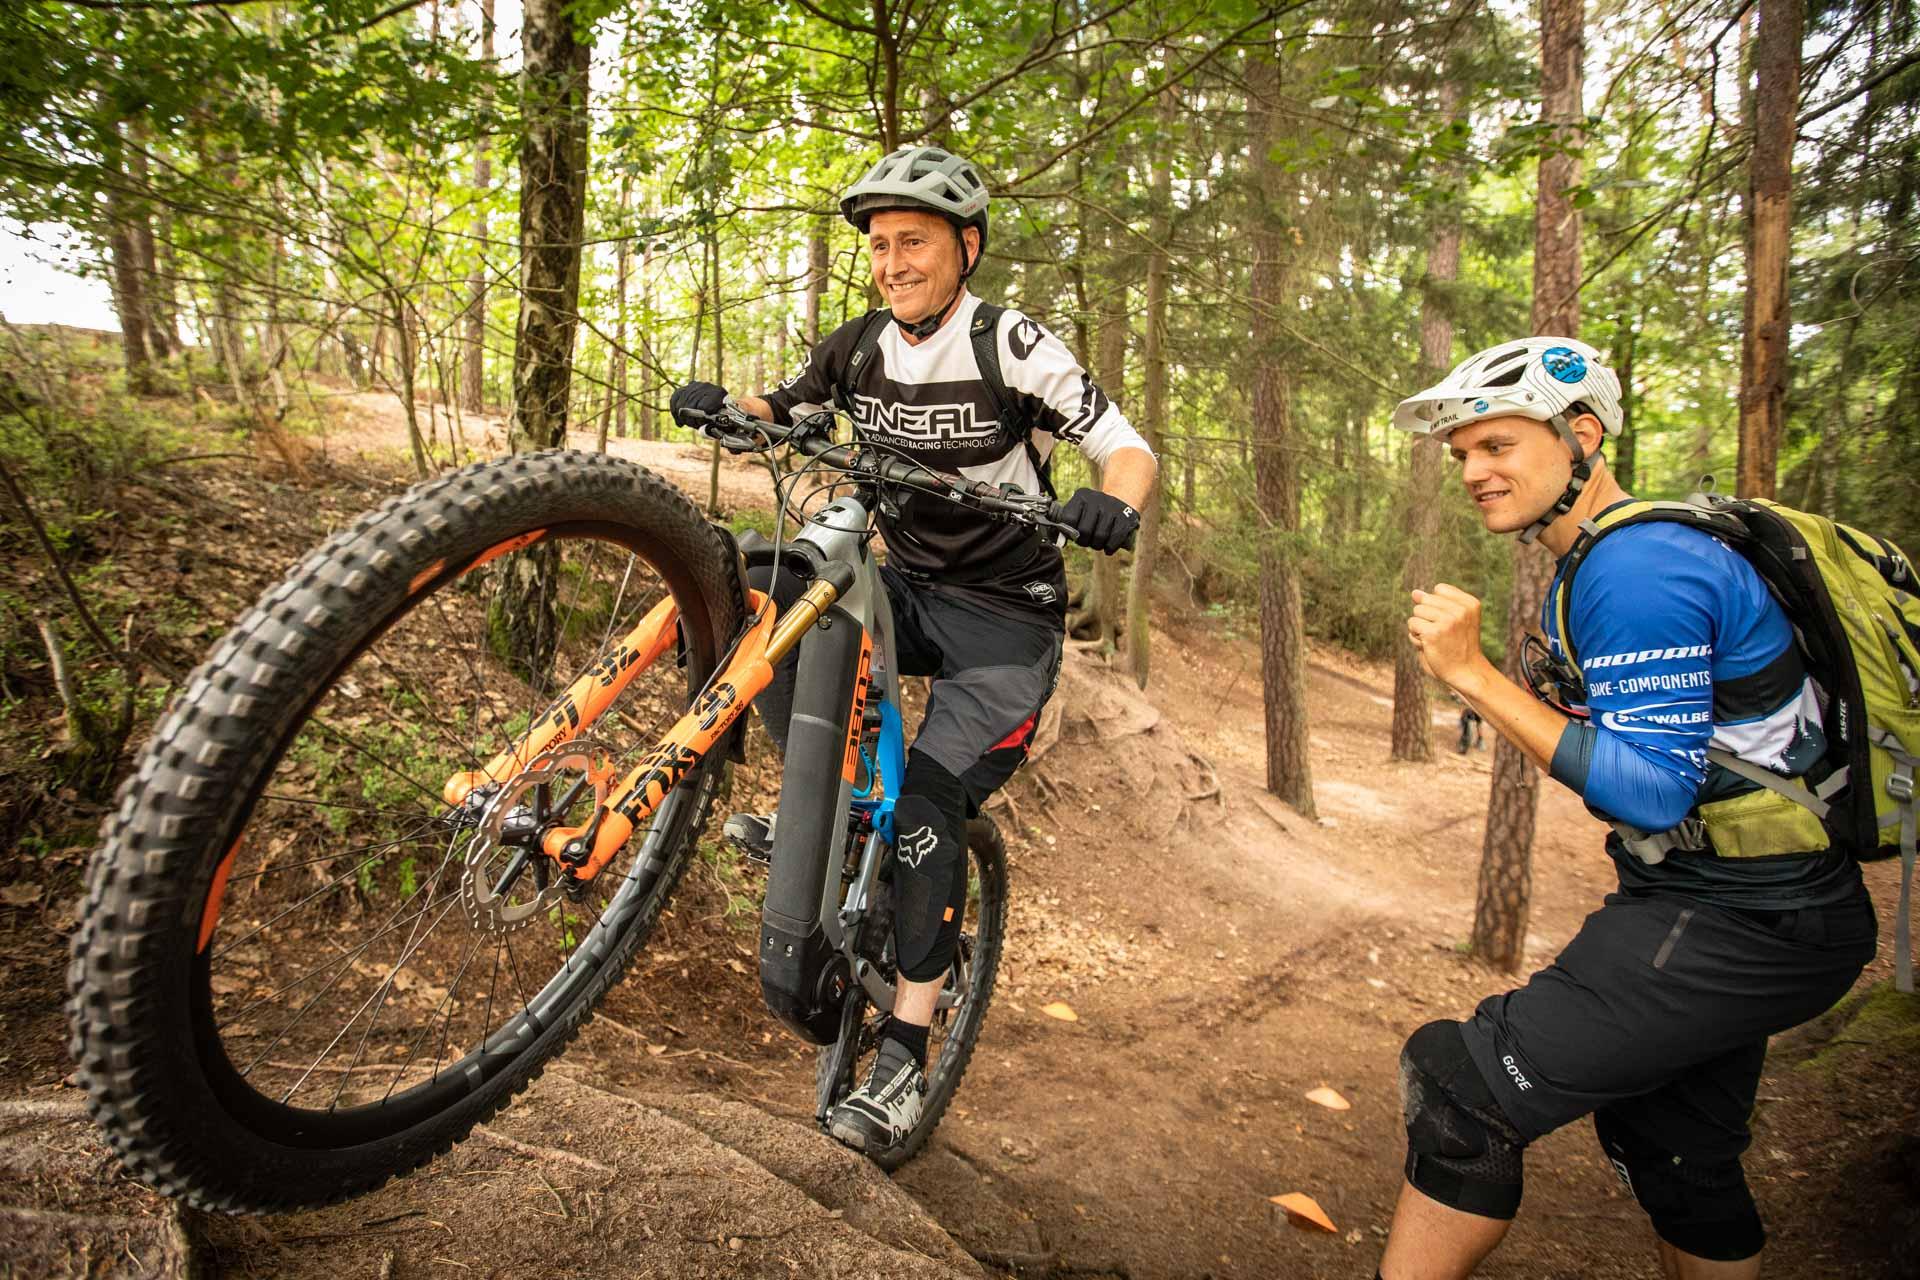 eMTB eBike Fortgeschritten Fahrtechnik Kurs in Siegen - Rock my Trail Bikeschule31